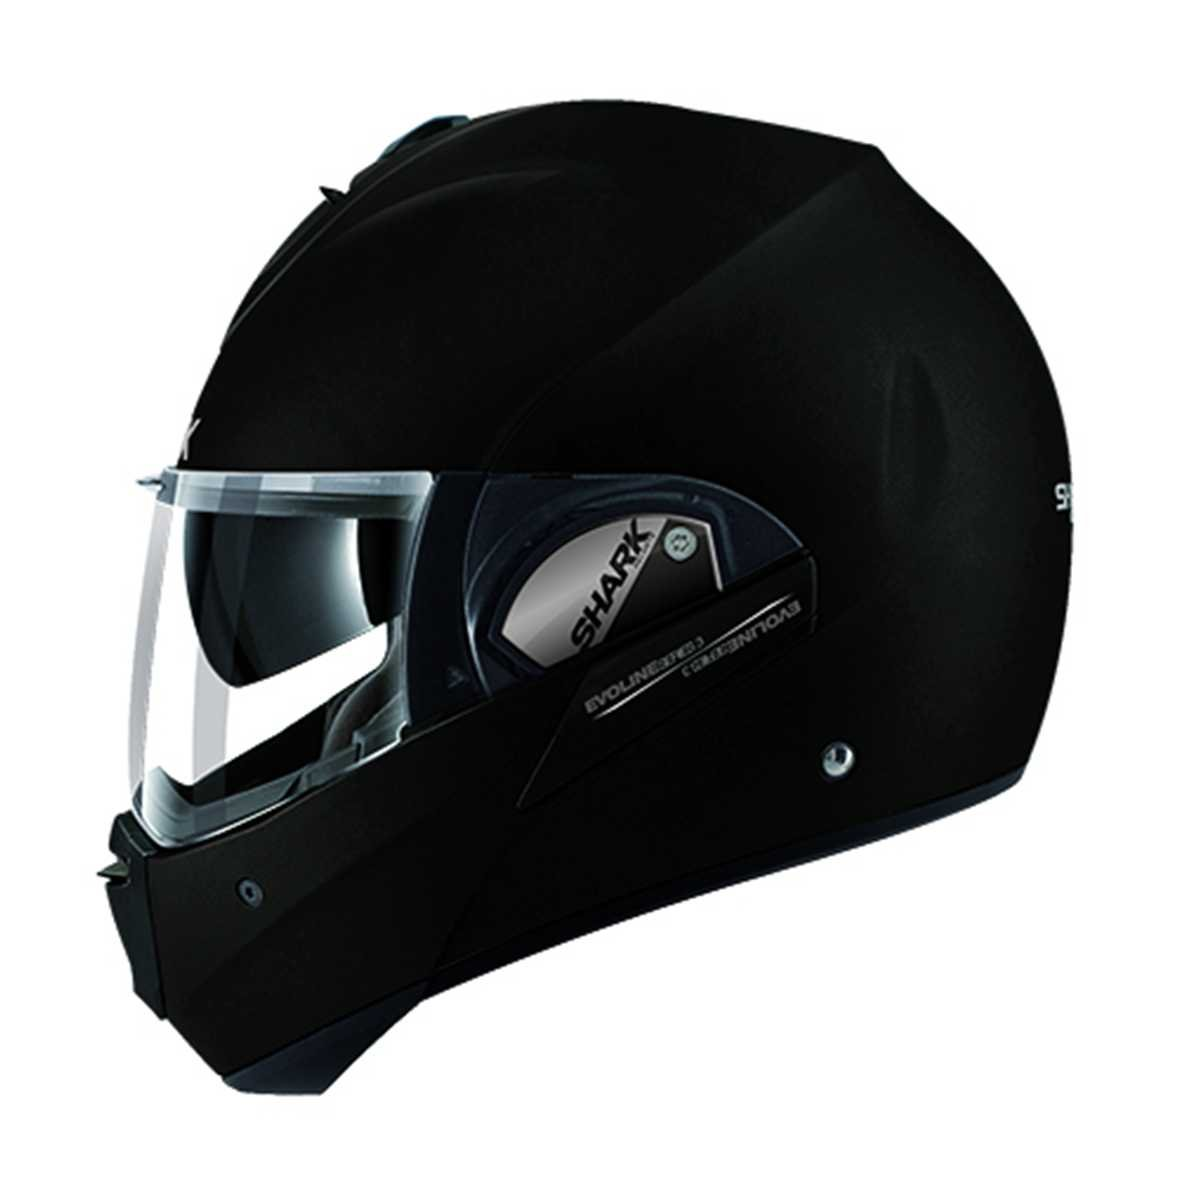 2ceb25931 cheap Shark Evoline Series 3 Black Helmet (XL) - test.lifegenmon.si